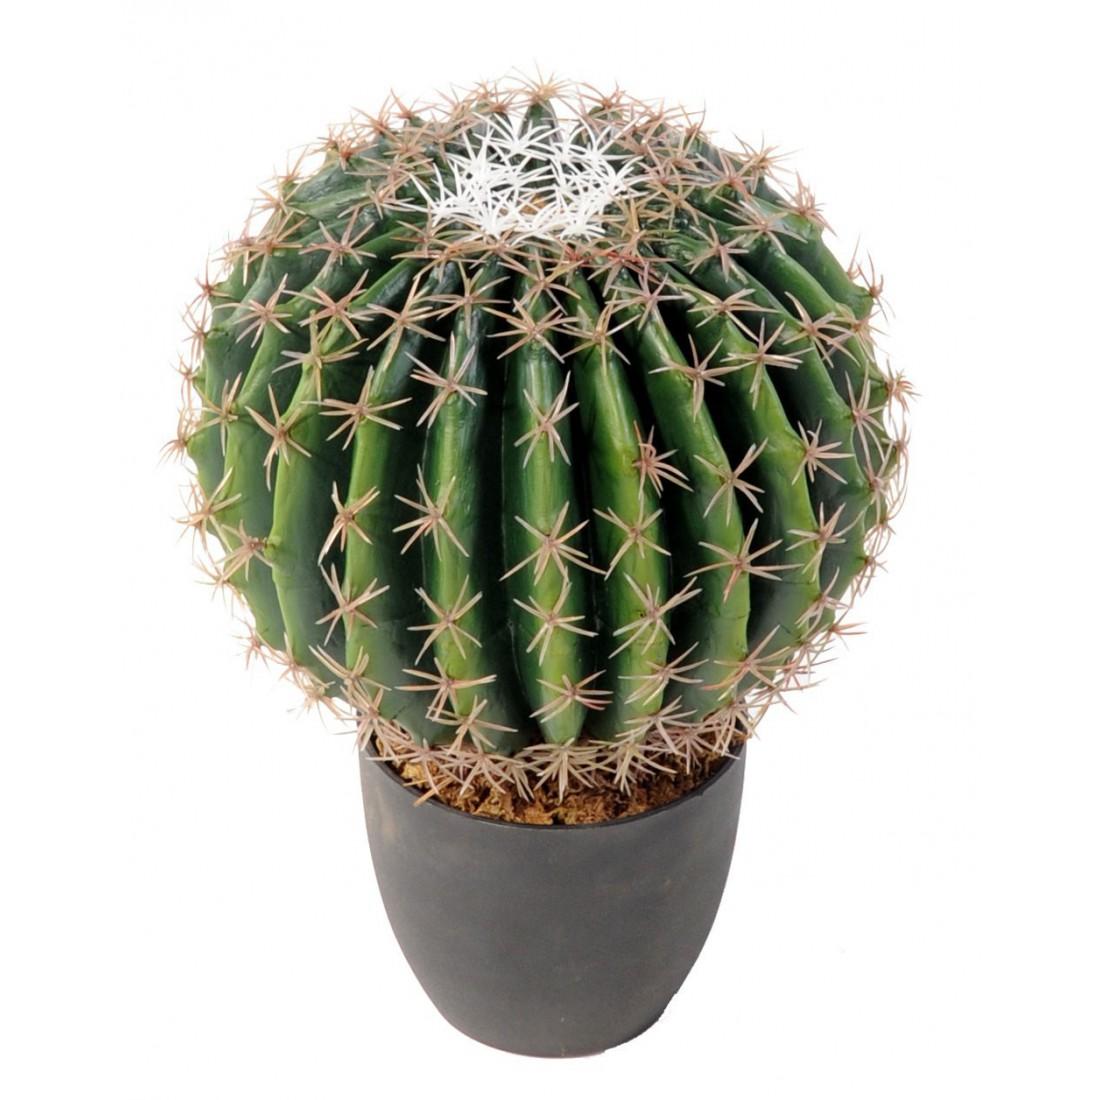 Cactus artificiel echino diam 20 ou 30 cm ou golden barrel for Cactus artificiel